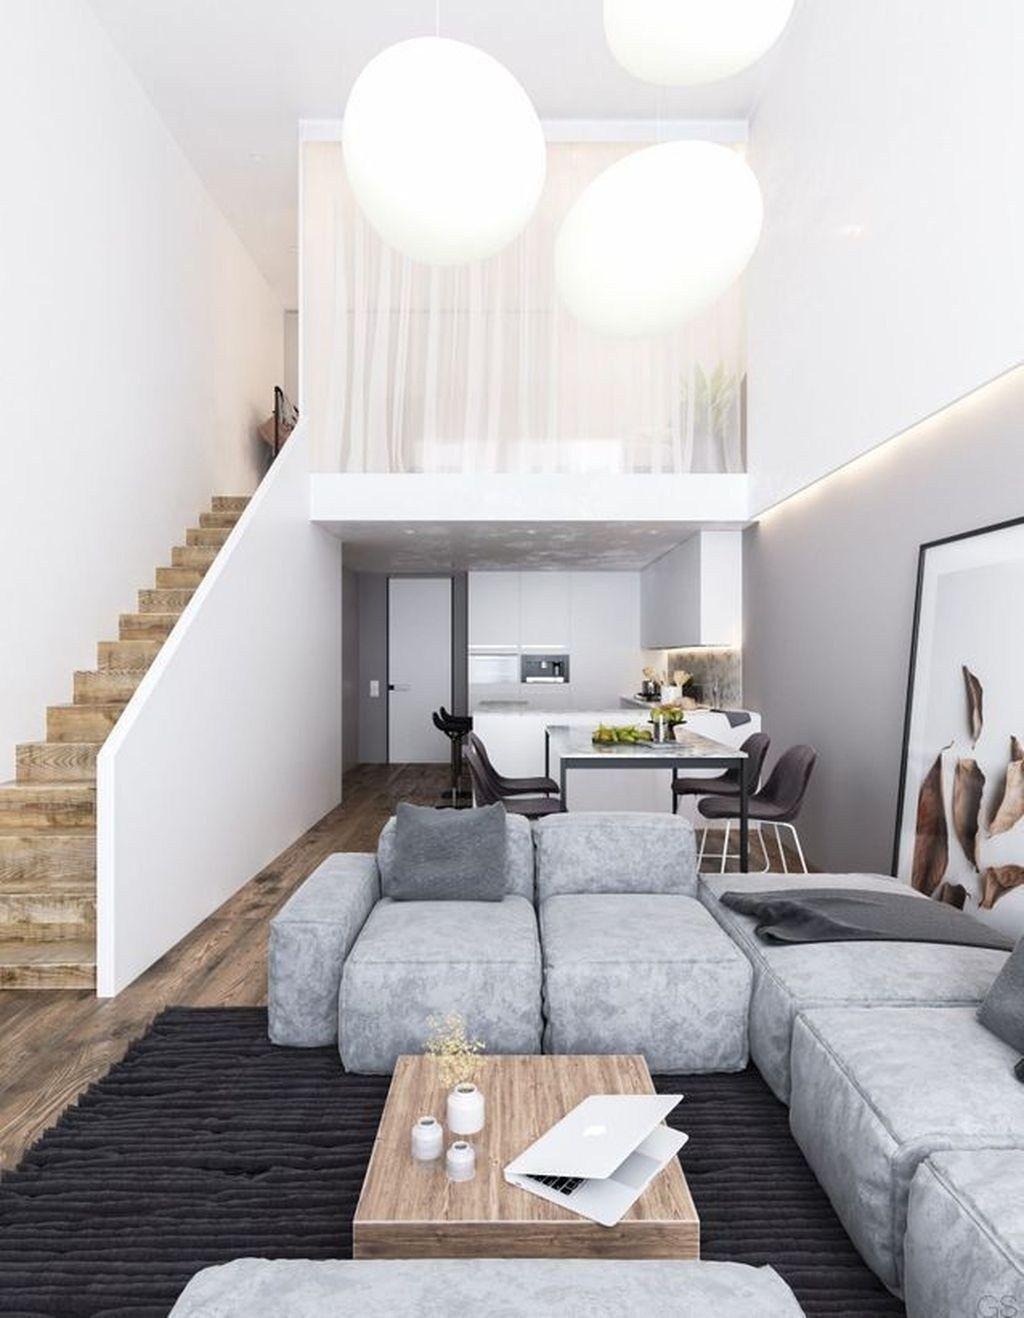 37 Easy And Simple Loft Home Decor Ideas To Inspire Loft House Tiny House Interior Loft Design